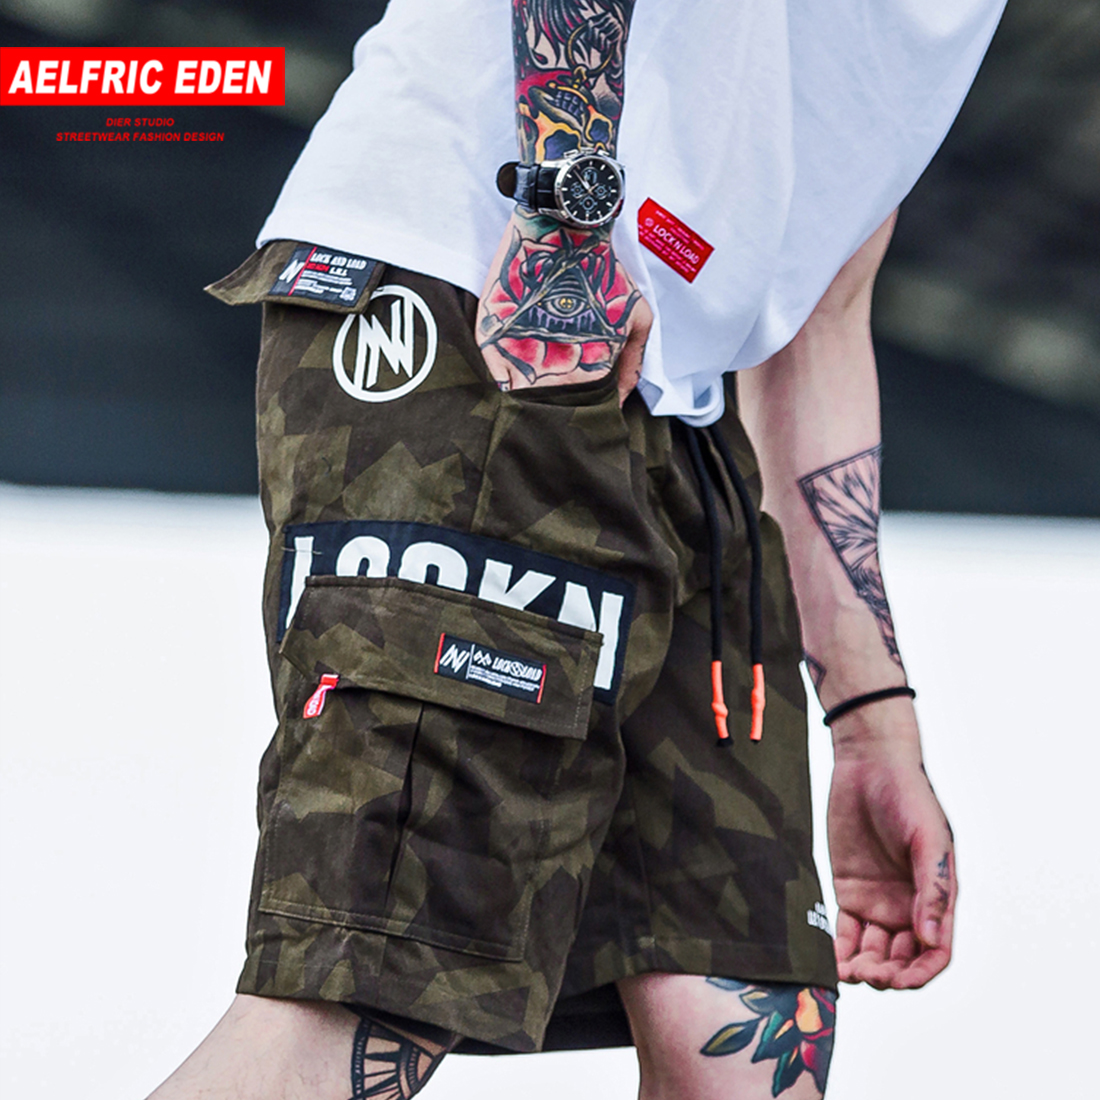 Aelfric Eden Cargo Shorts Men Hip Hop Summer Streetwear Letter Print Camouflage Print 2019 New Fashion Knee Length Short Joggers